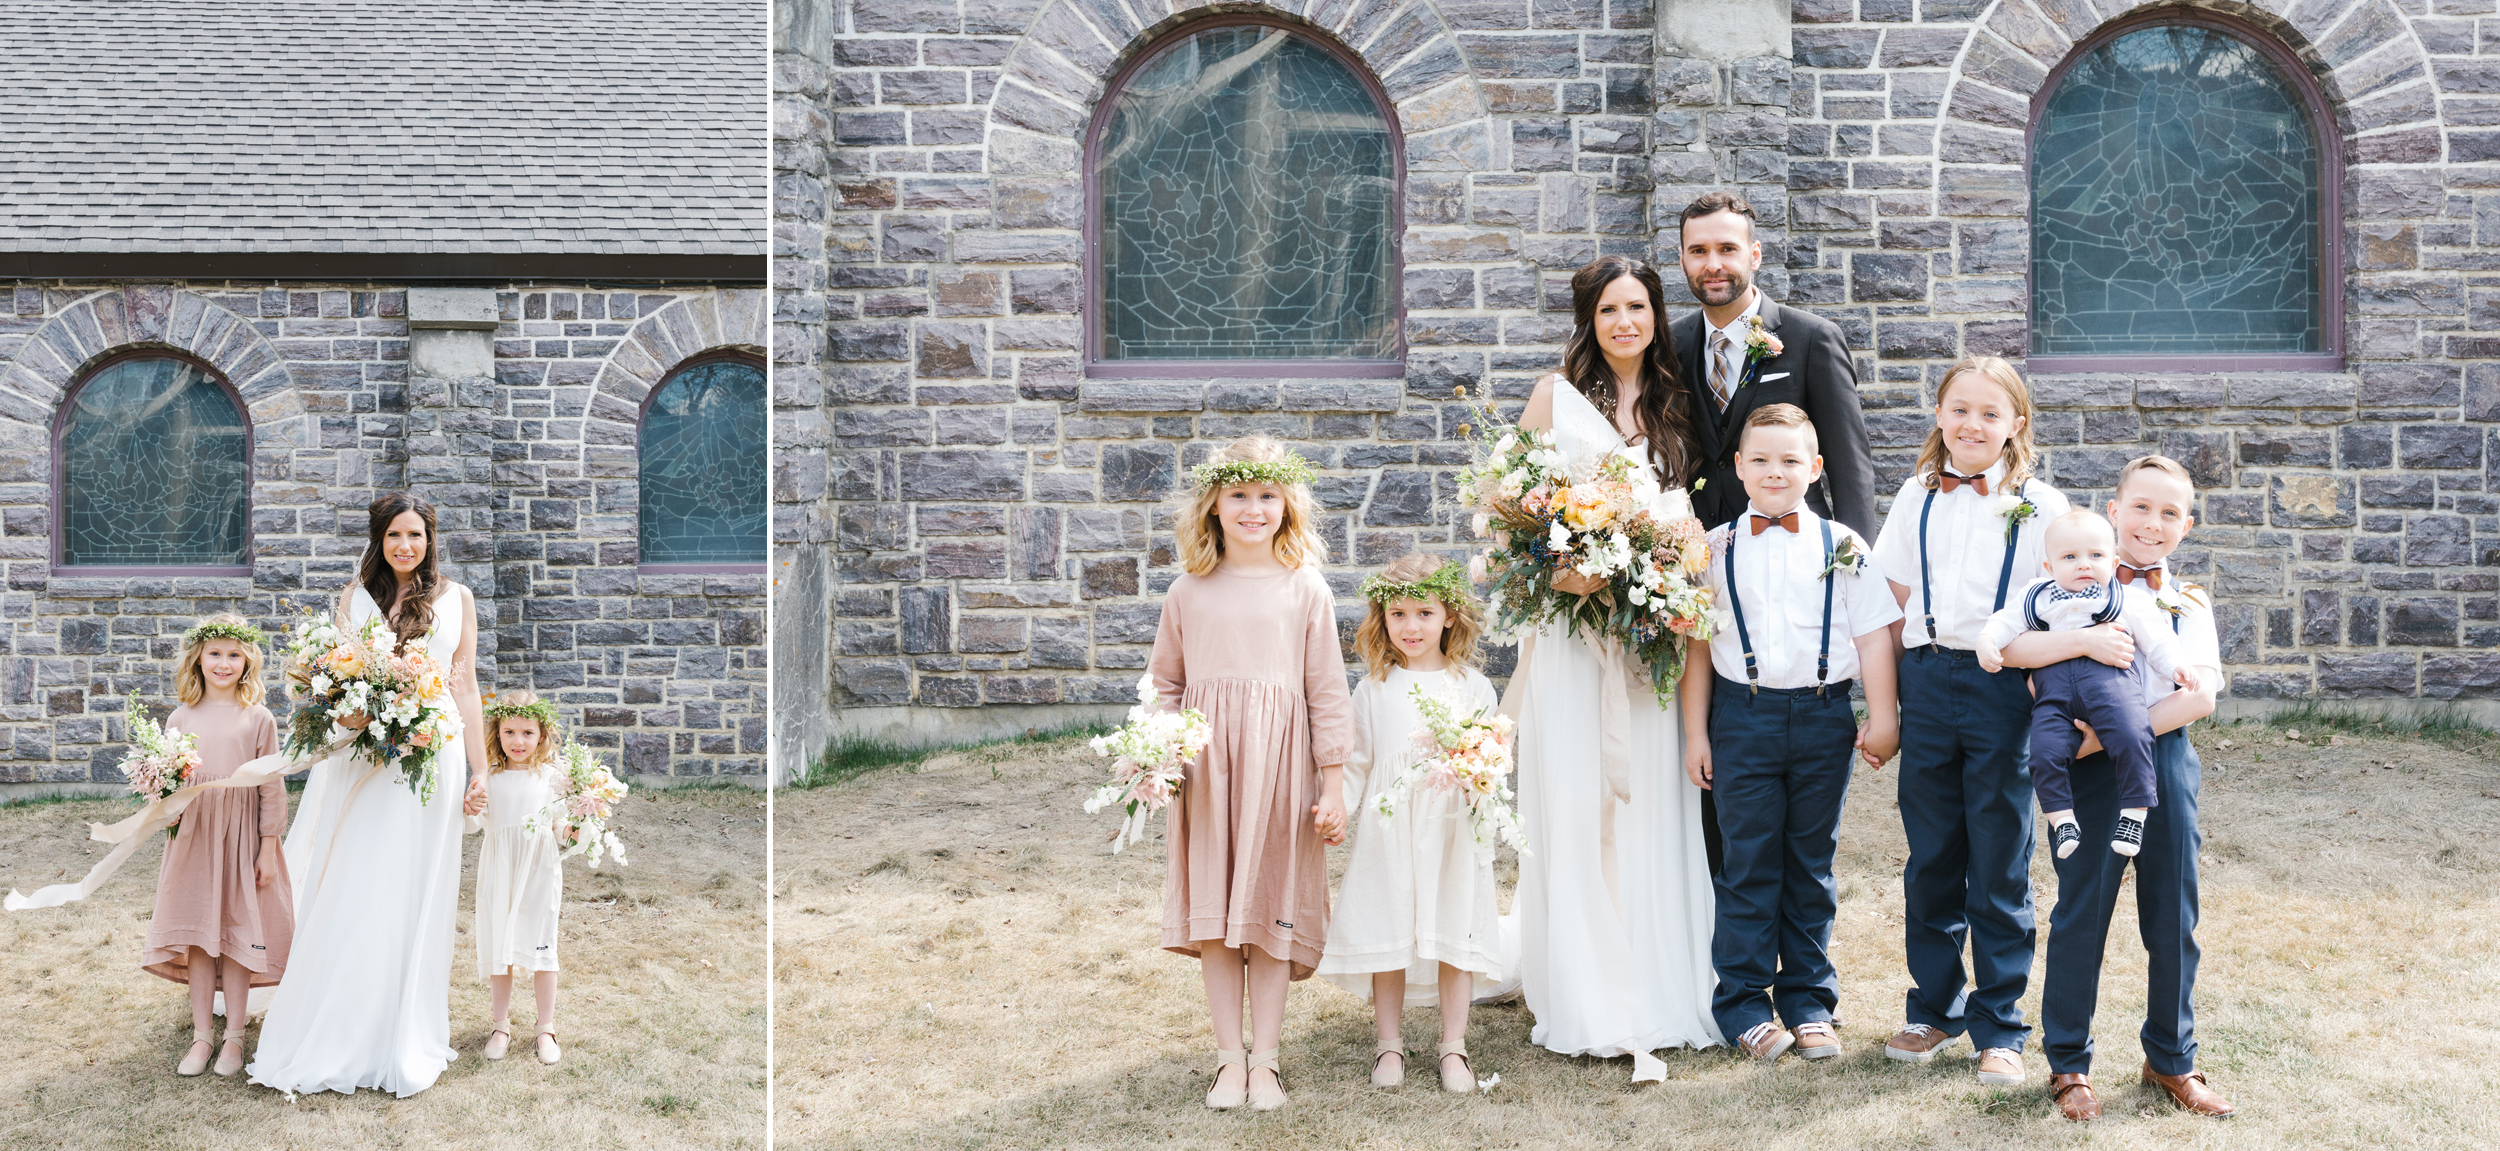 Canmore_Wedding_Photographers0020.jpg